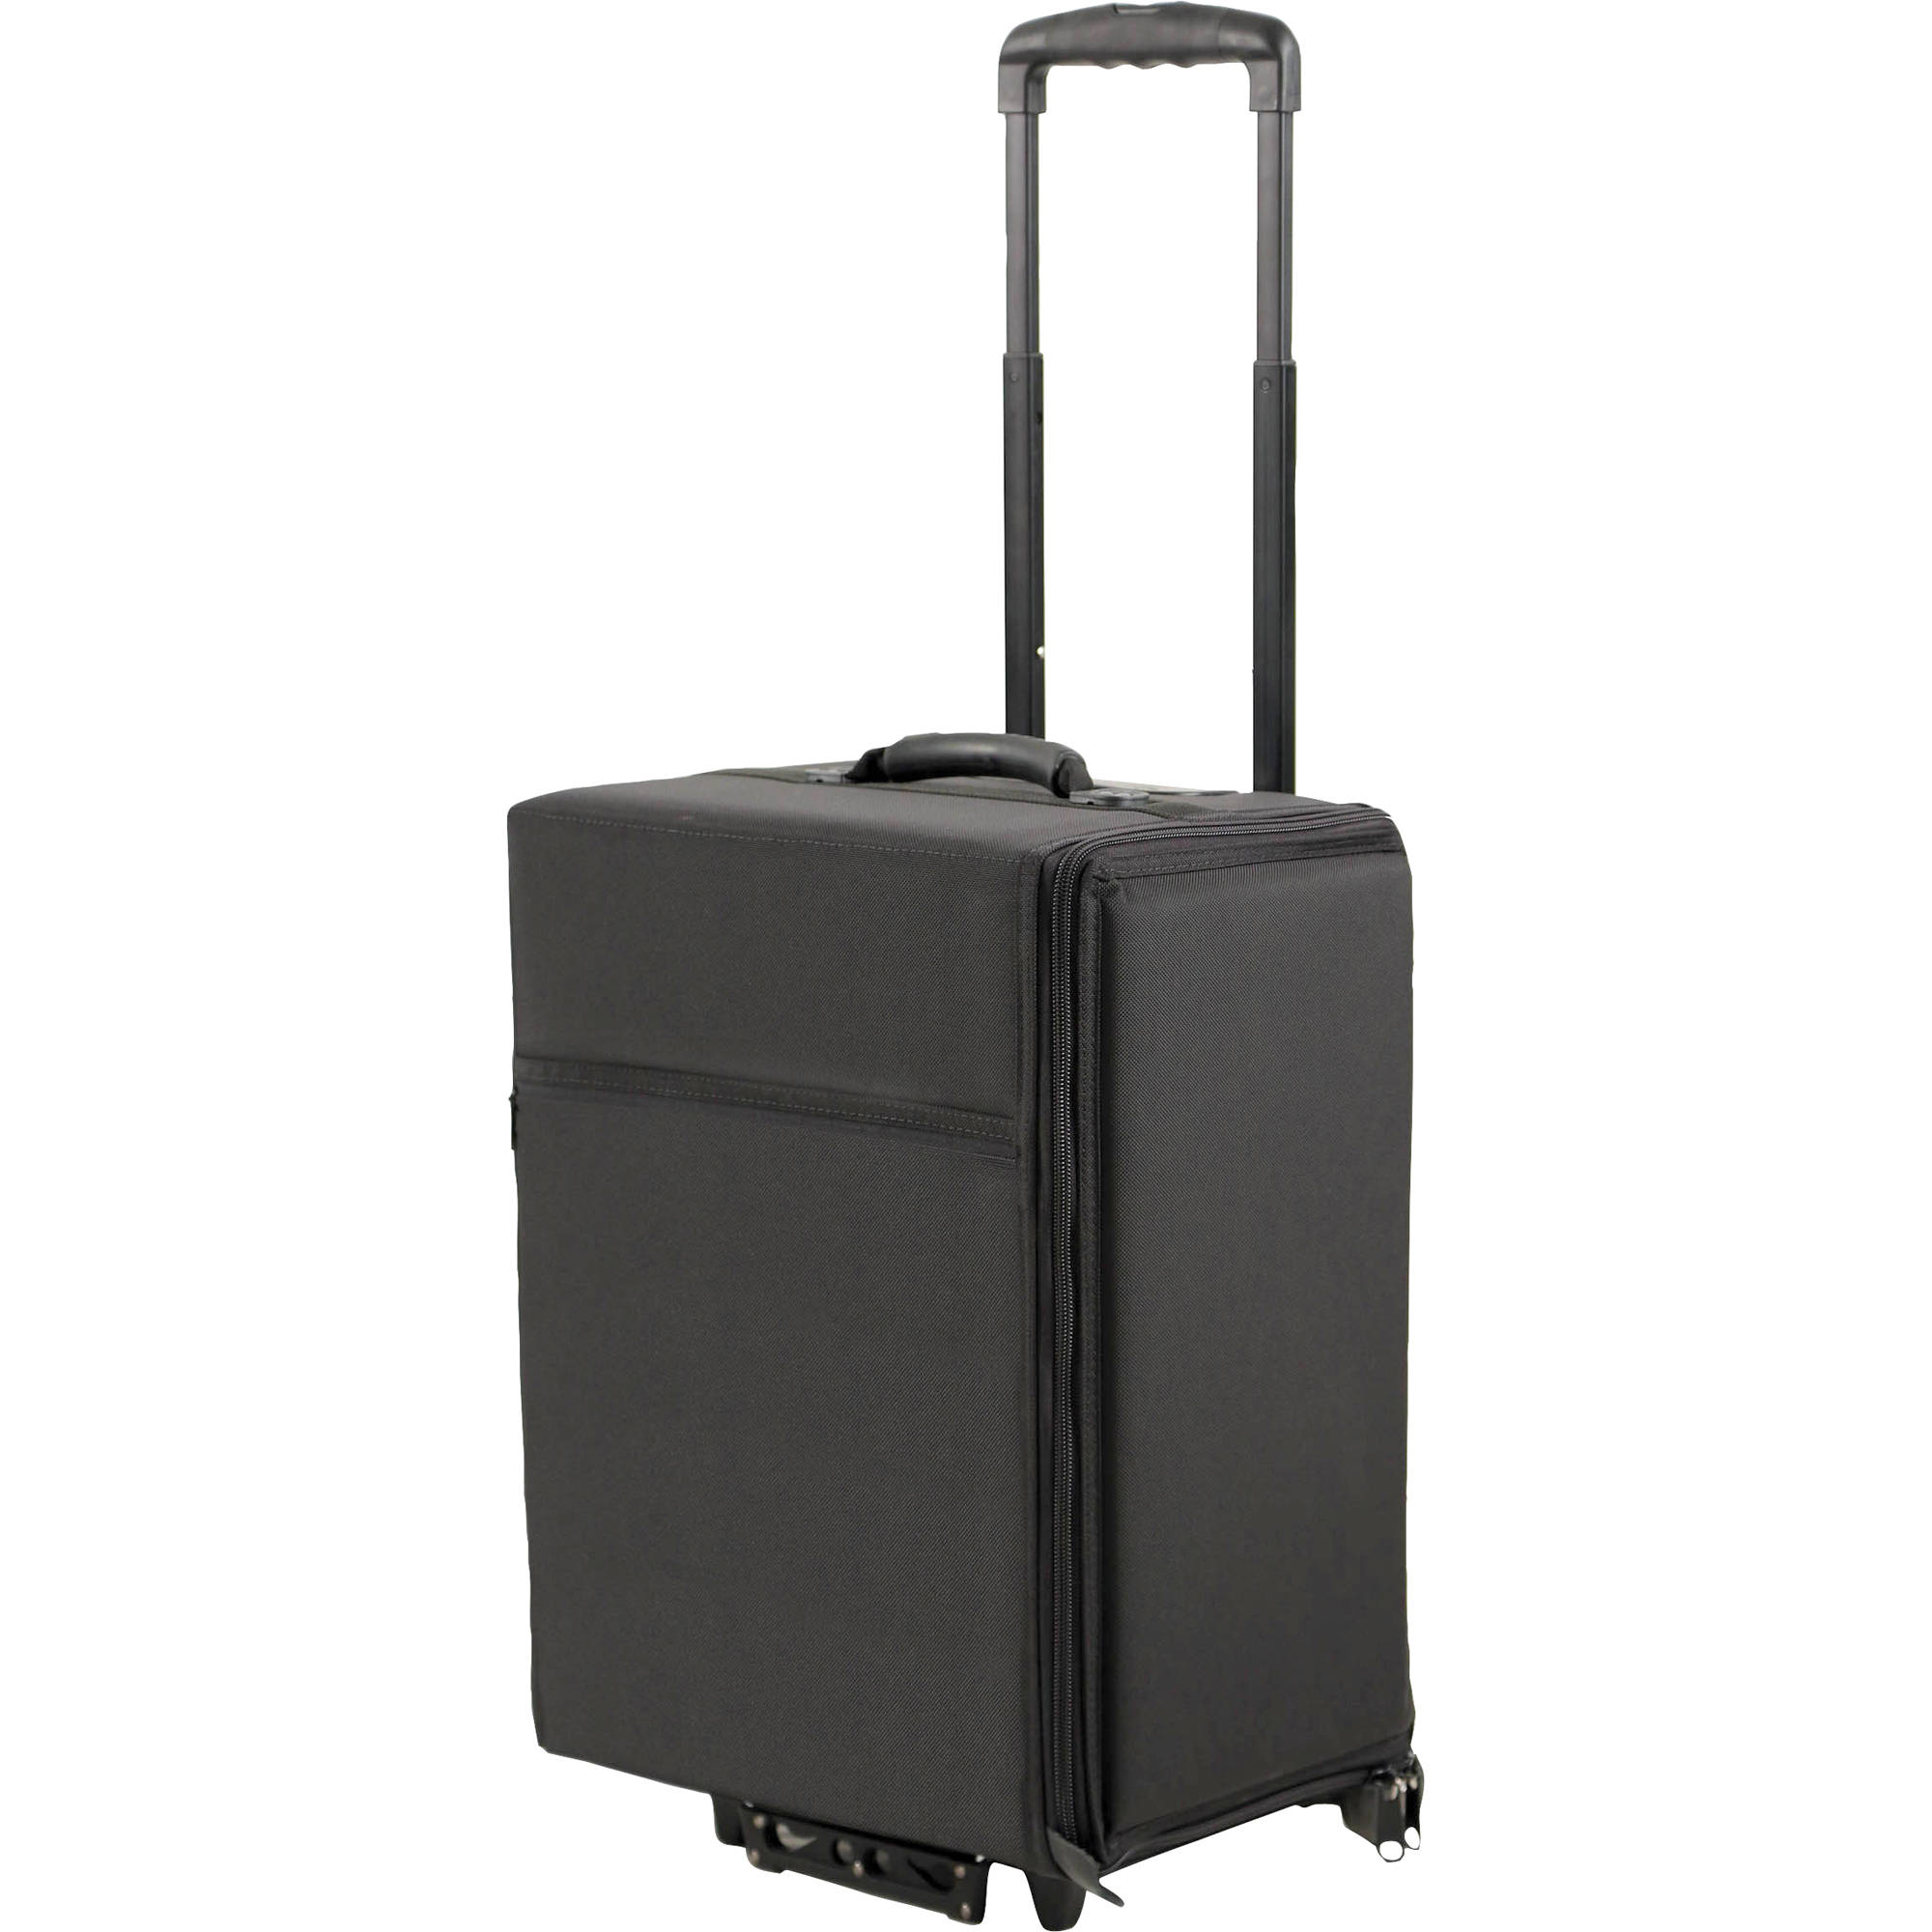 Amazonbasics Universal Travel Case For Small Electronics